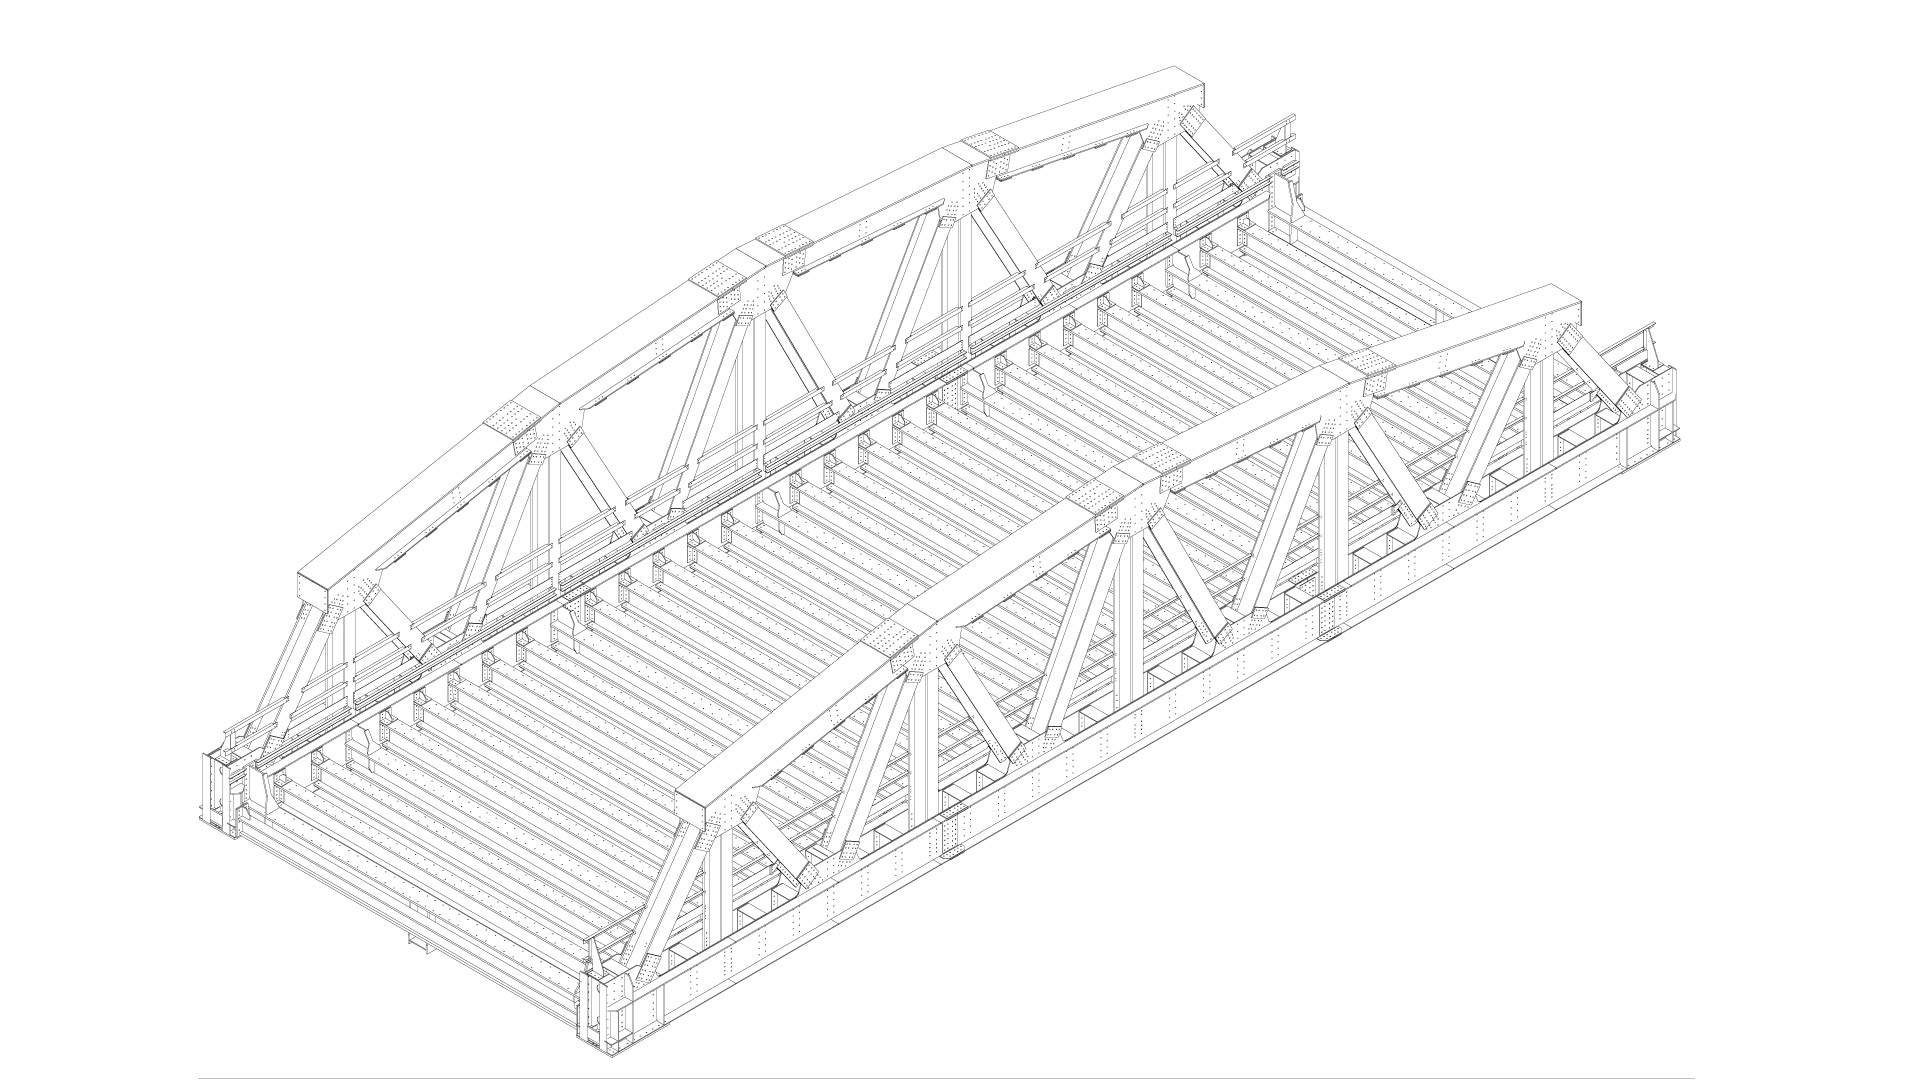 ponte-portella-progetto-carpenteria-civile-industriale-metal-engineering